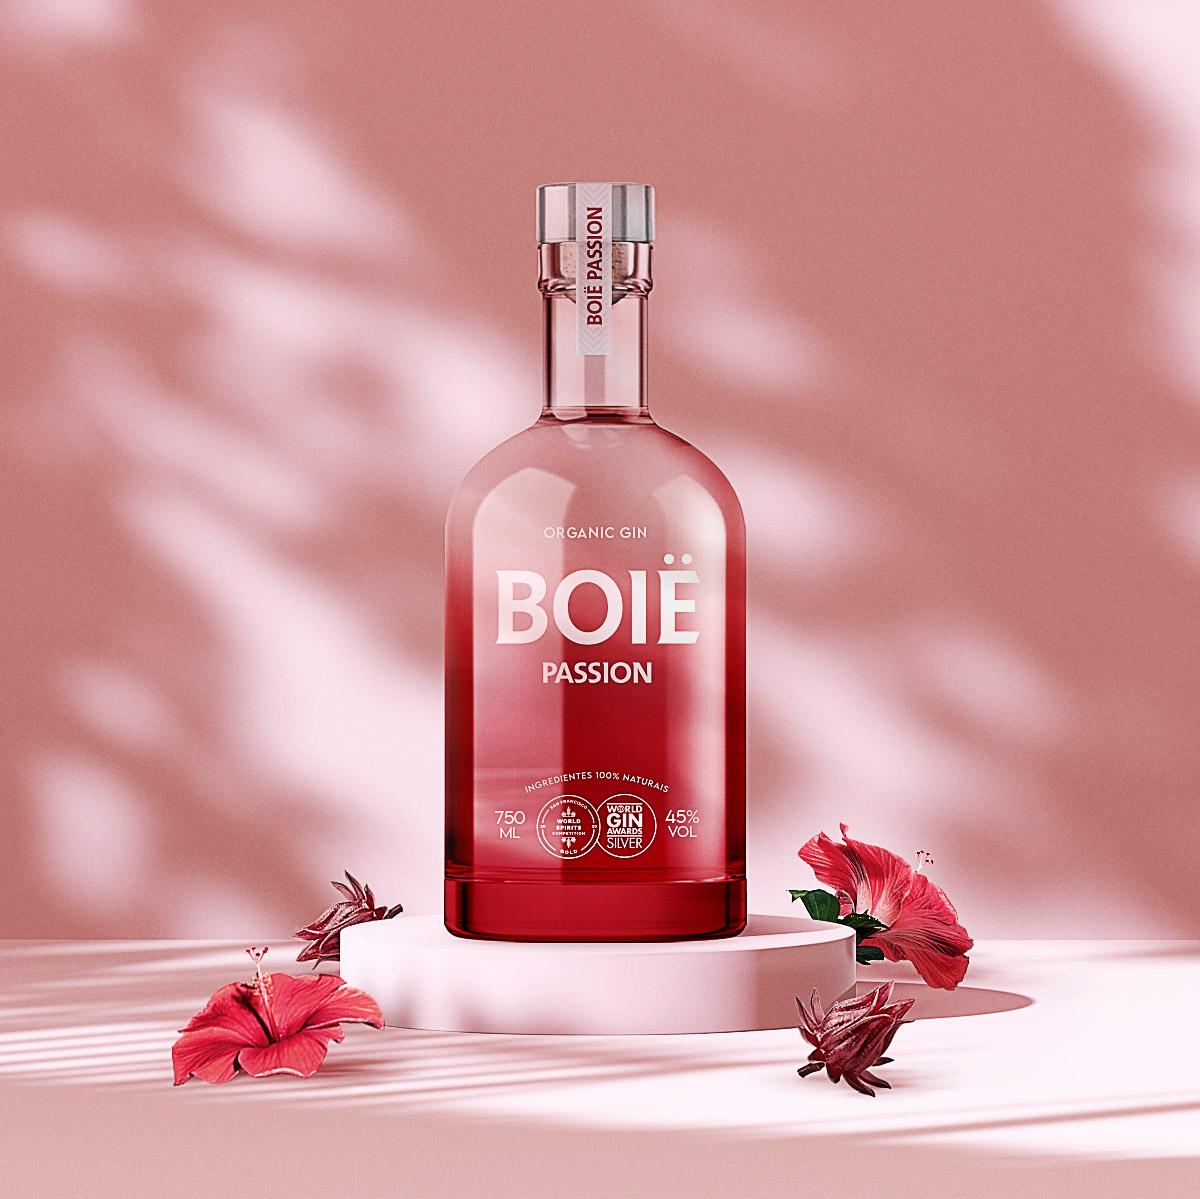 Boië Organic Gin New Packaging Design by Vbiasi Design